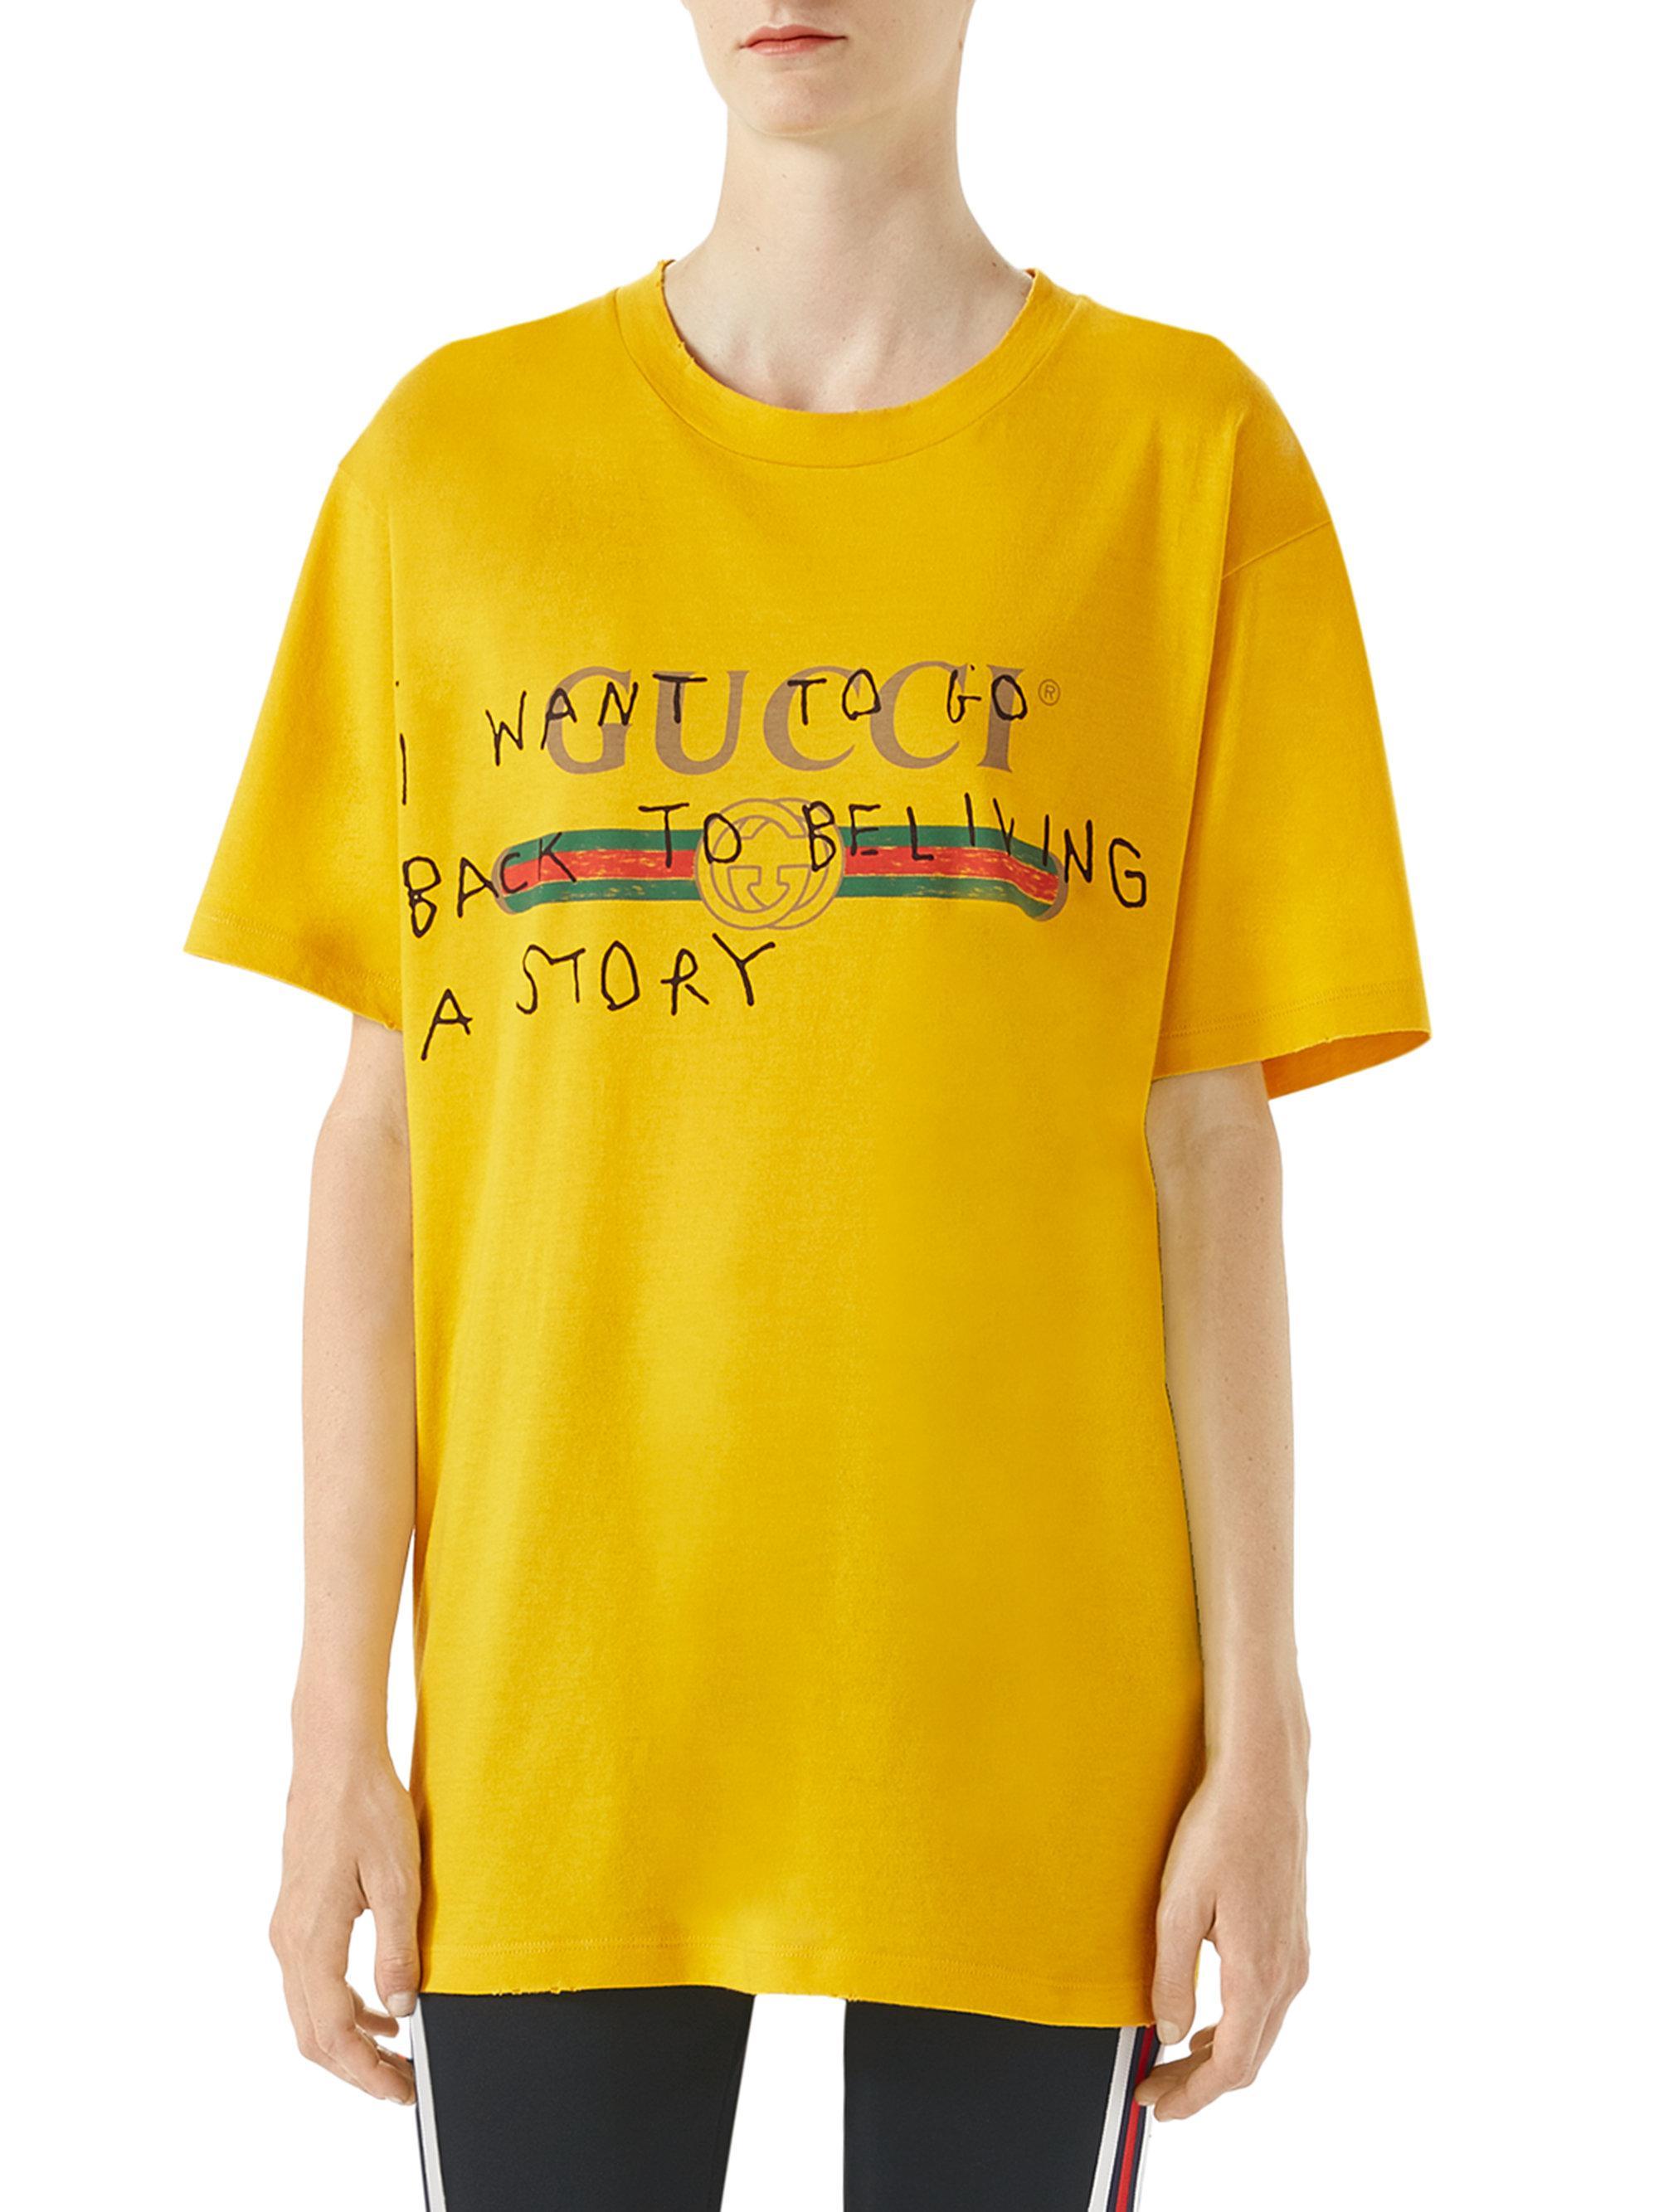 2b0b5480 Gucci Logo Writing T-shirt in Yellow - Lyst